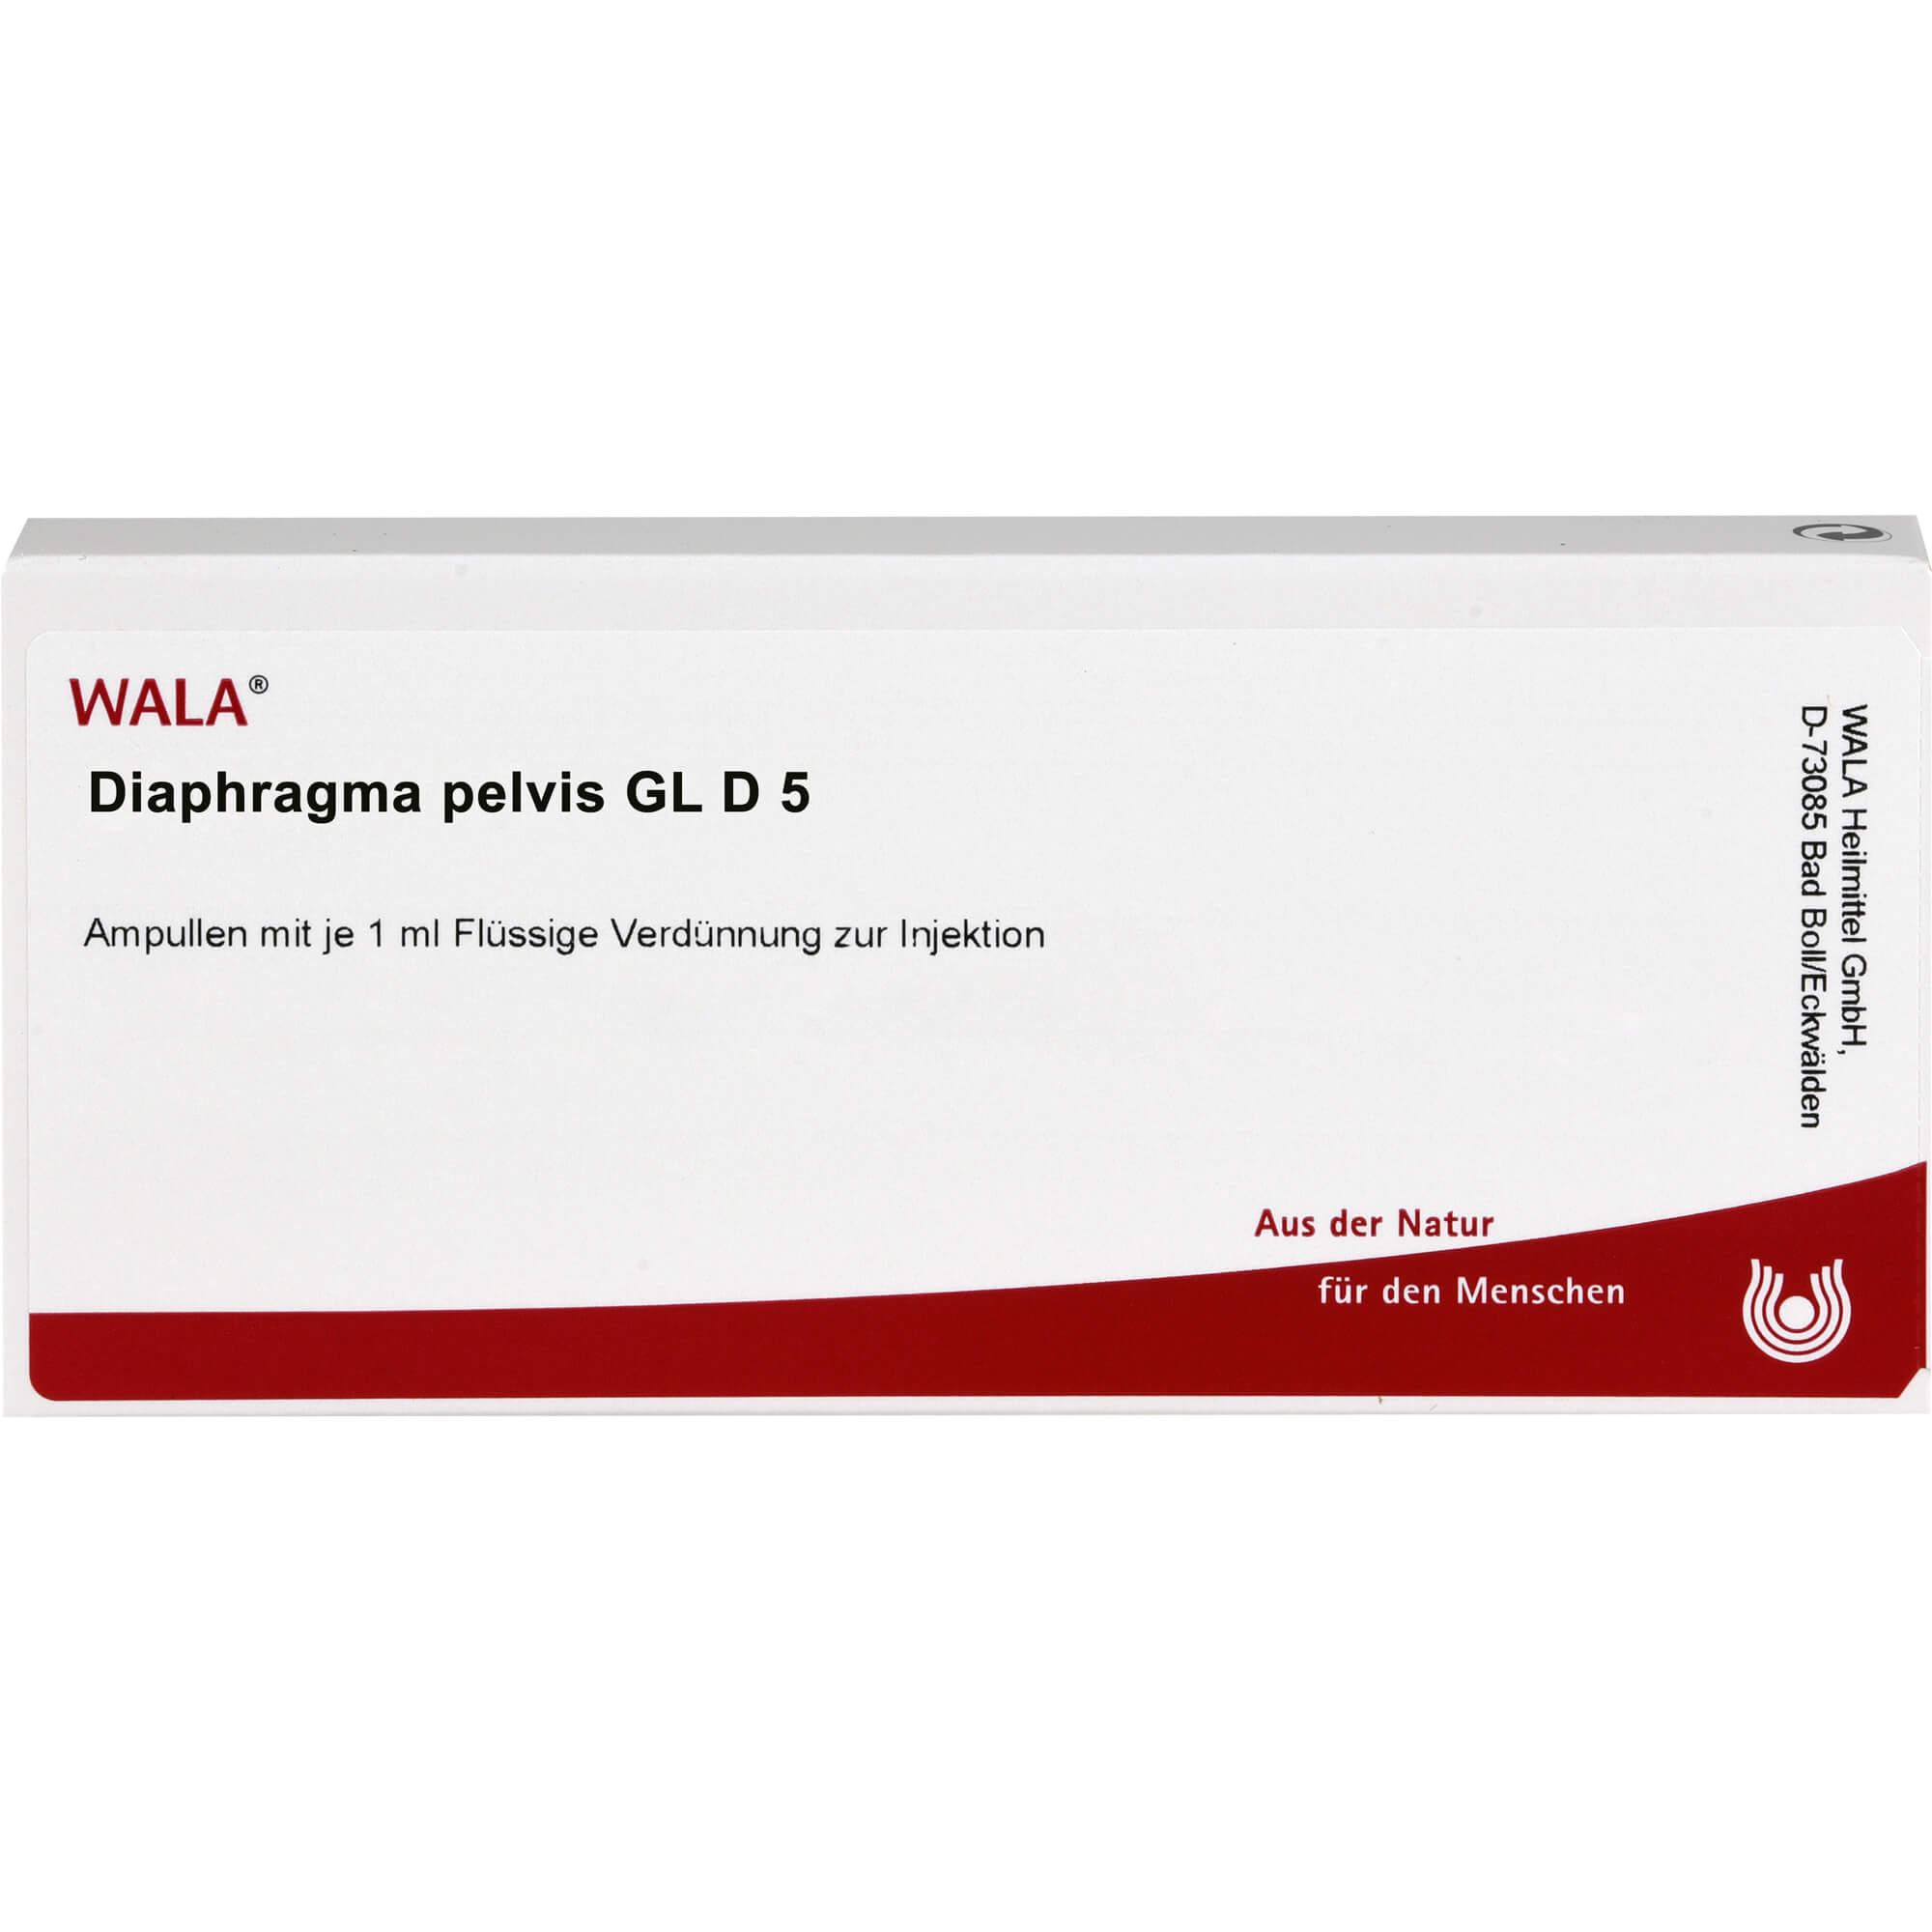 DIAPHRAGMA PELVIS GL D 5 Ampullen